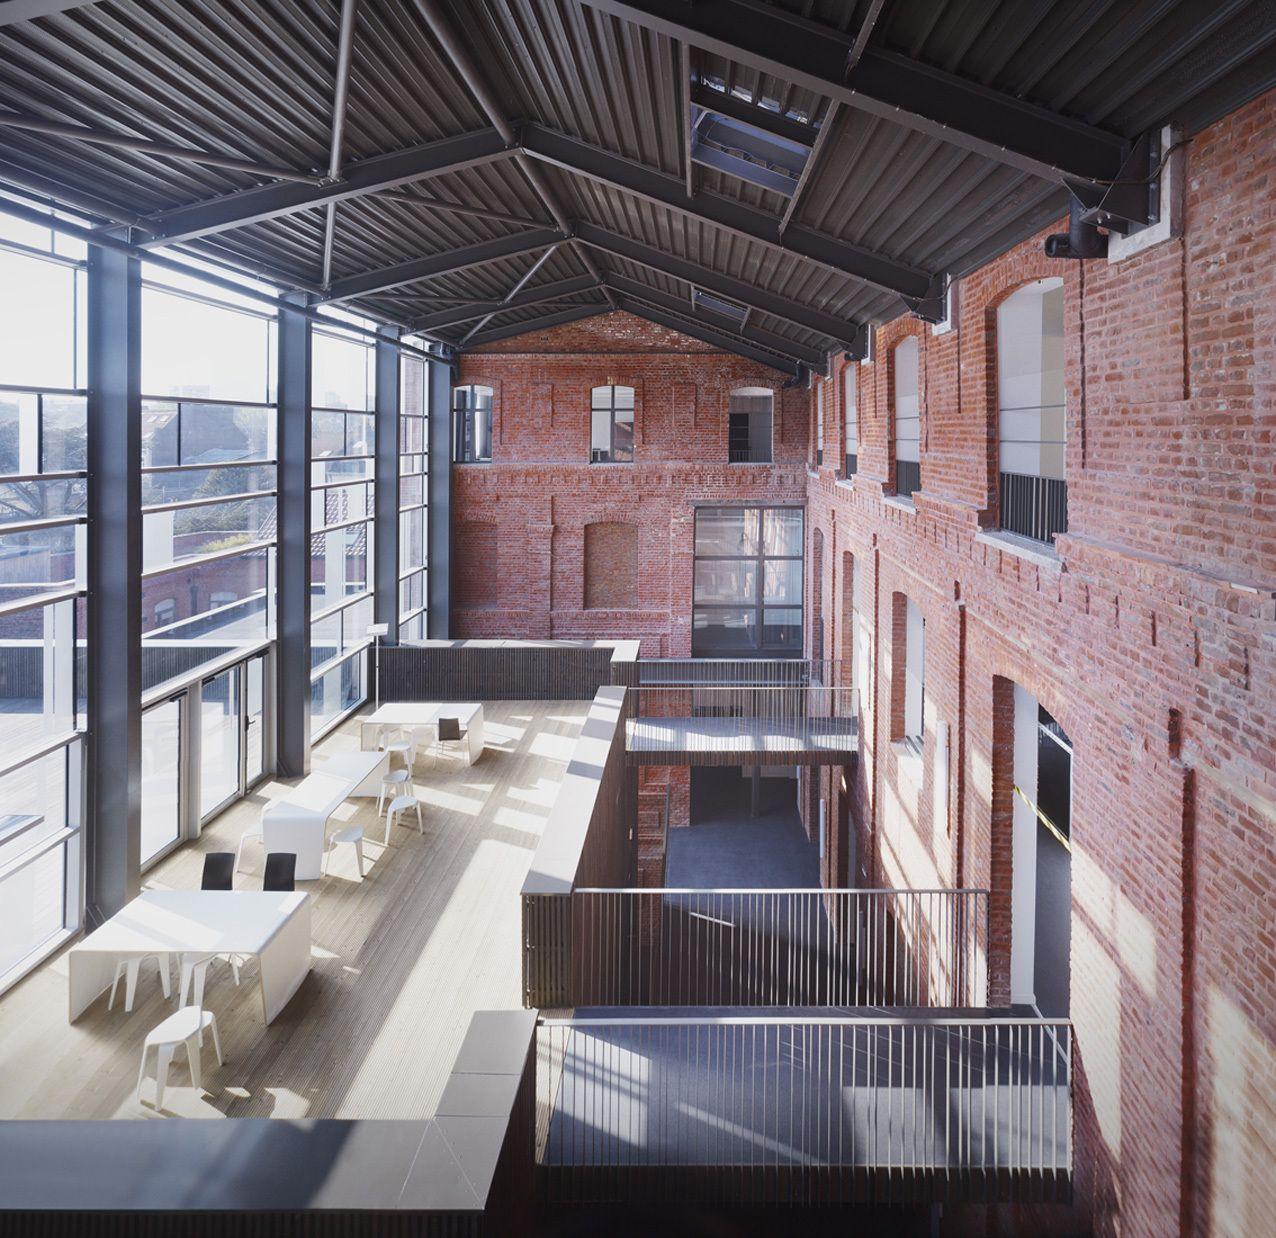 Galeria: Galeria De Academia De Música De Roubaix / Zig Zag